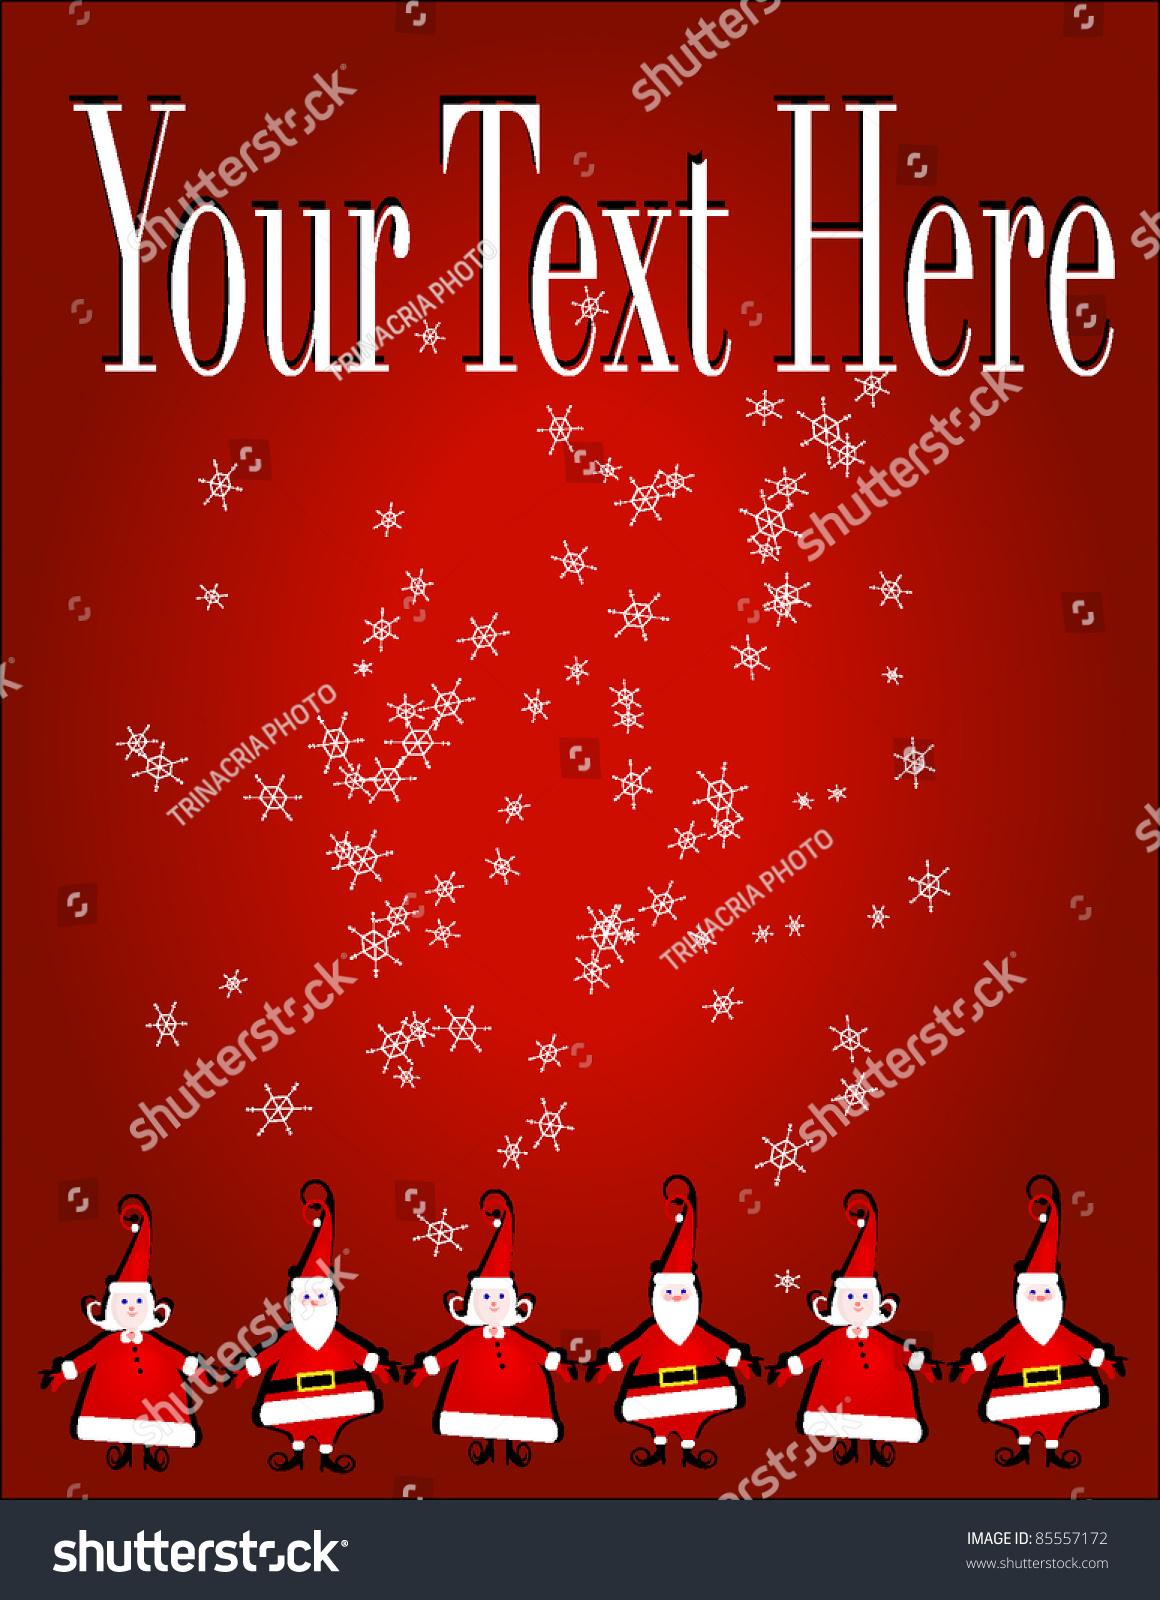 christmas invitation flyer or background santa claus elf christmas invitation flyer or background santa claus elf types stock vector 85557172 shutterstock